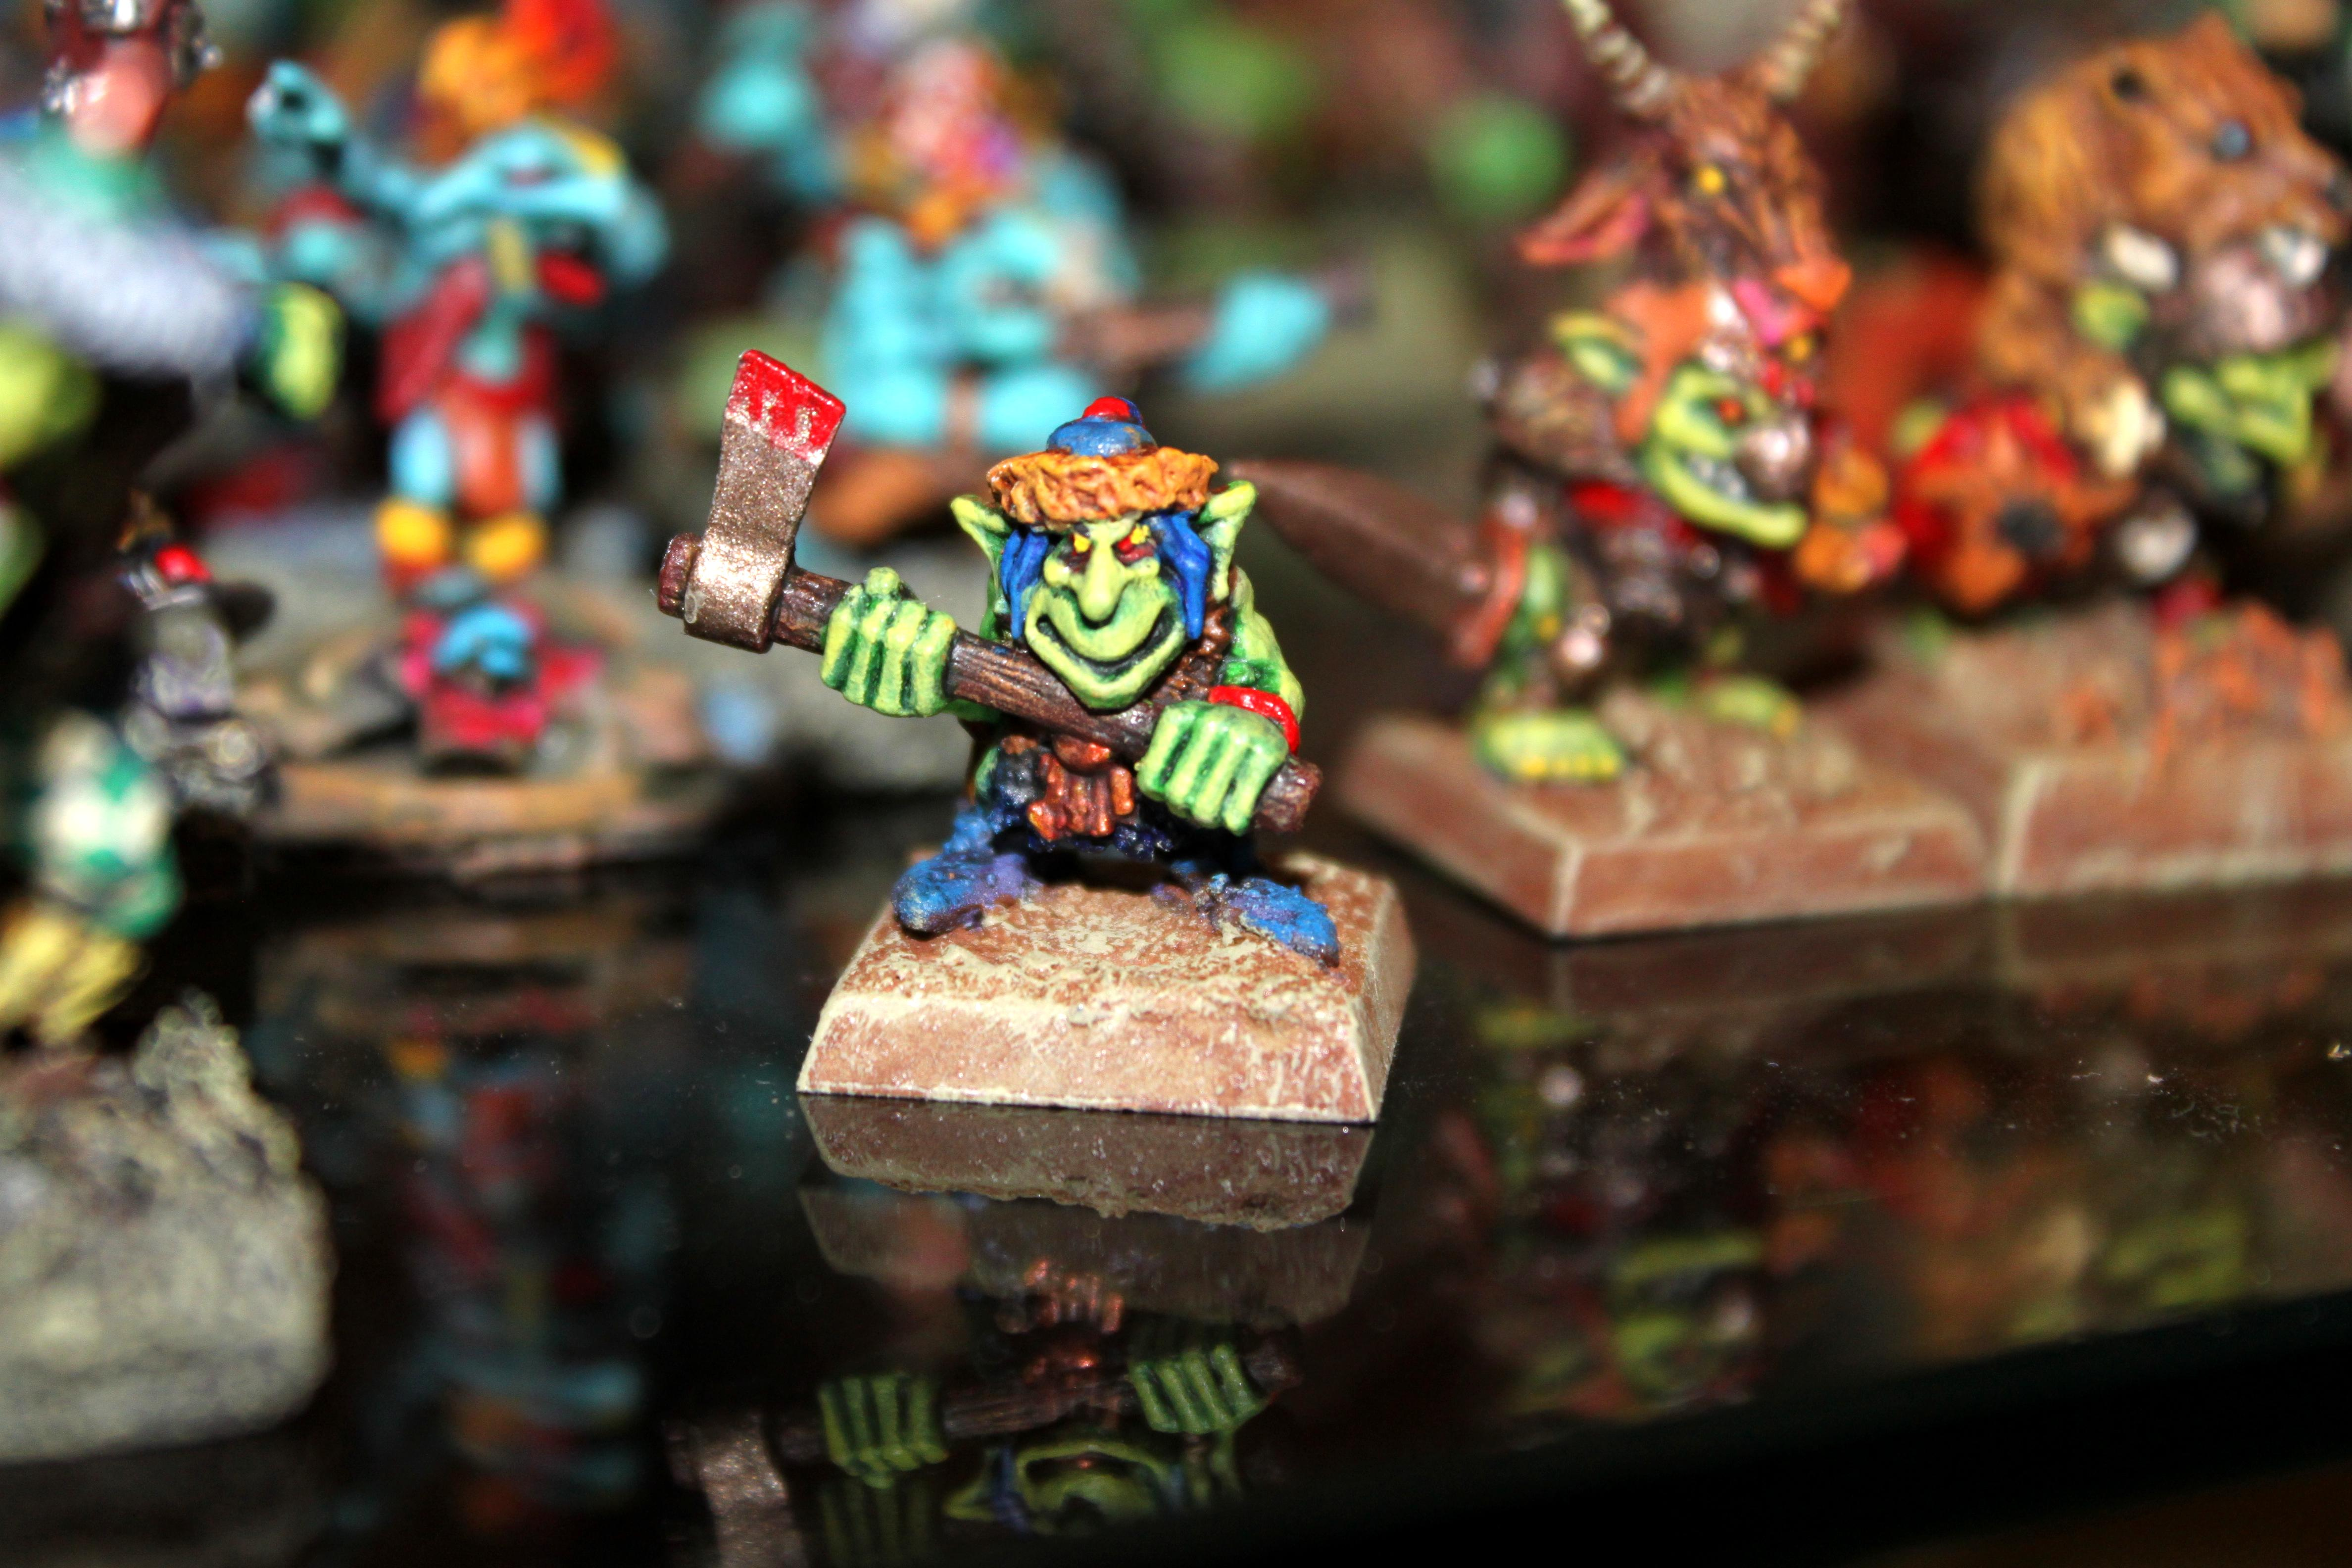 Forest Goblin, Goblins, Mordheim, Orcs, Rogue Trader, Spider, Warhammer Fantasy, Wfb